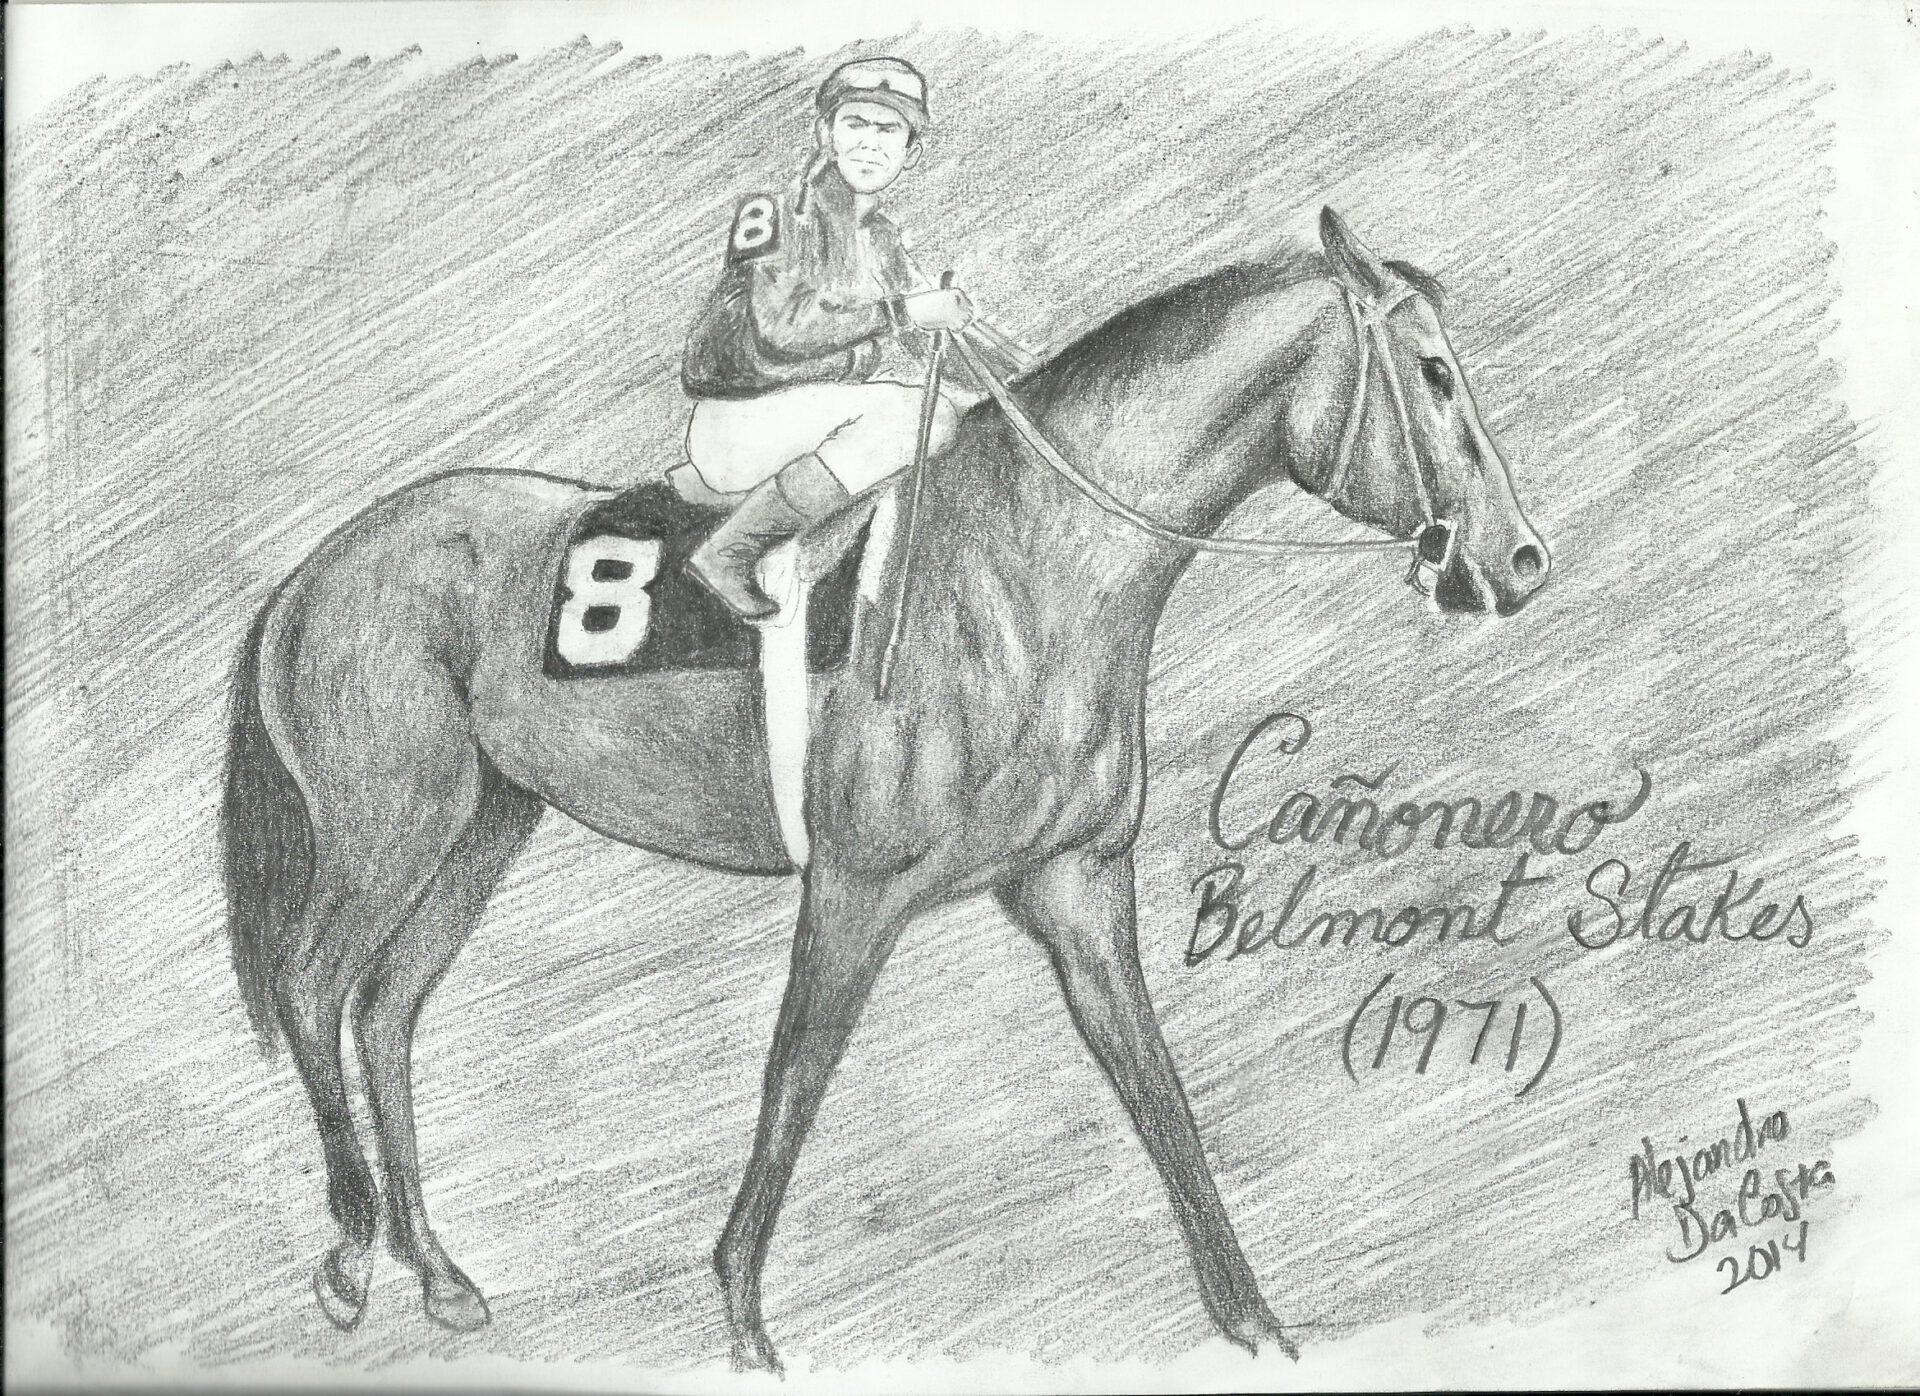 Cañonero, Horse, dibujo que ilustra al caballo al momento de salir a correr el Belmont Stakes de 1971, en Belmont Park. Obra del artista: Alejandro Da Costa